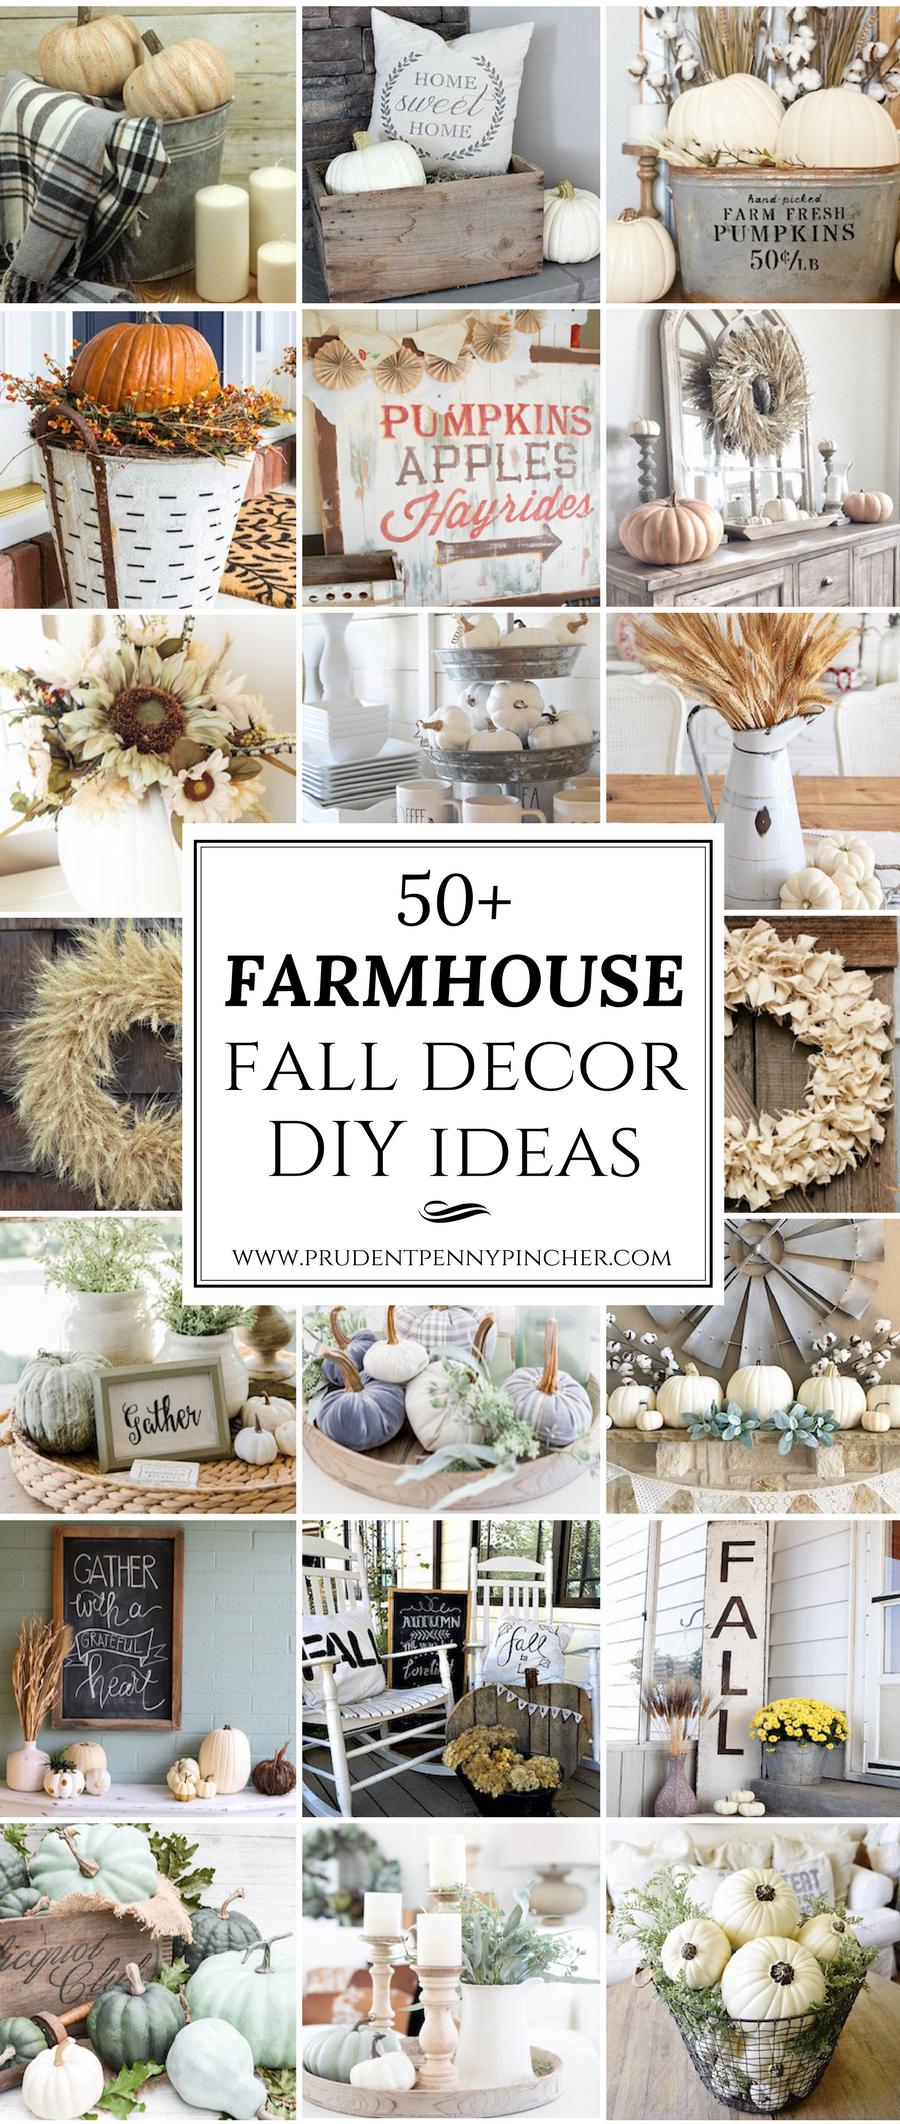 65 Farmhouse Fall Decor Ideas Farmhouse Fall Decor Fall Decor Diy Fall Decorations Porch